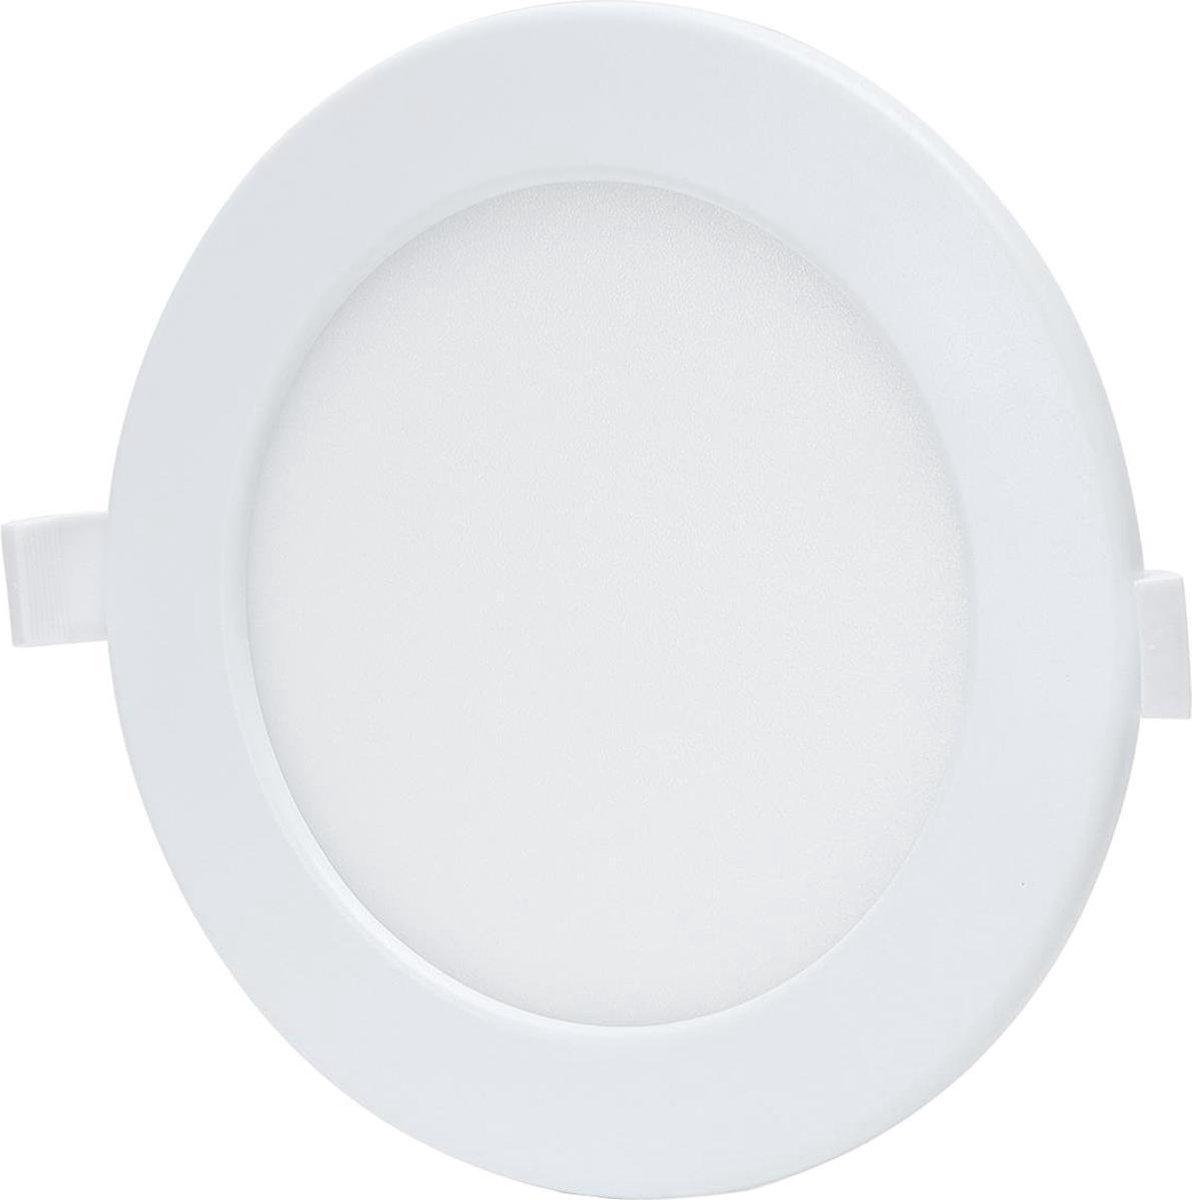 LED Downlight - Smart LED - Igory Zumba - 12W - Aanpasbare Kleur - Inbouw Rond - Mat Wit - Aluminium - Ø160mm